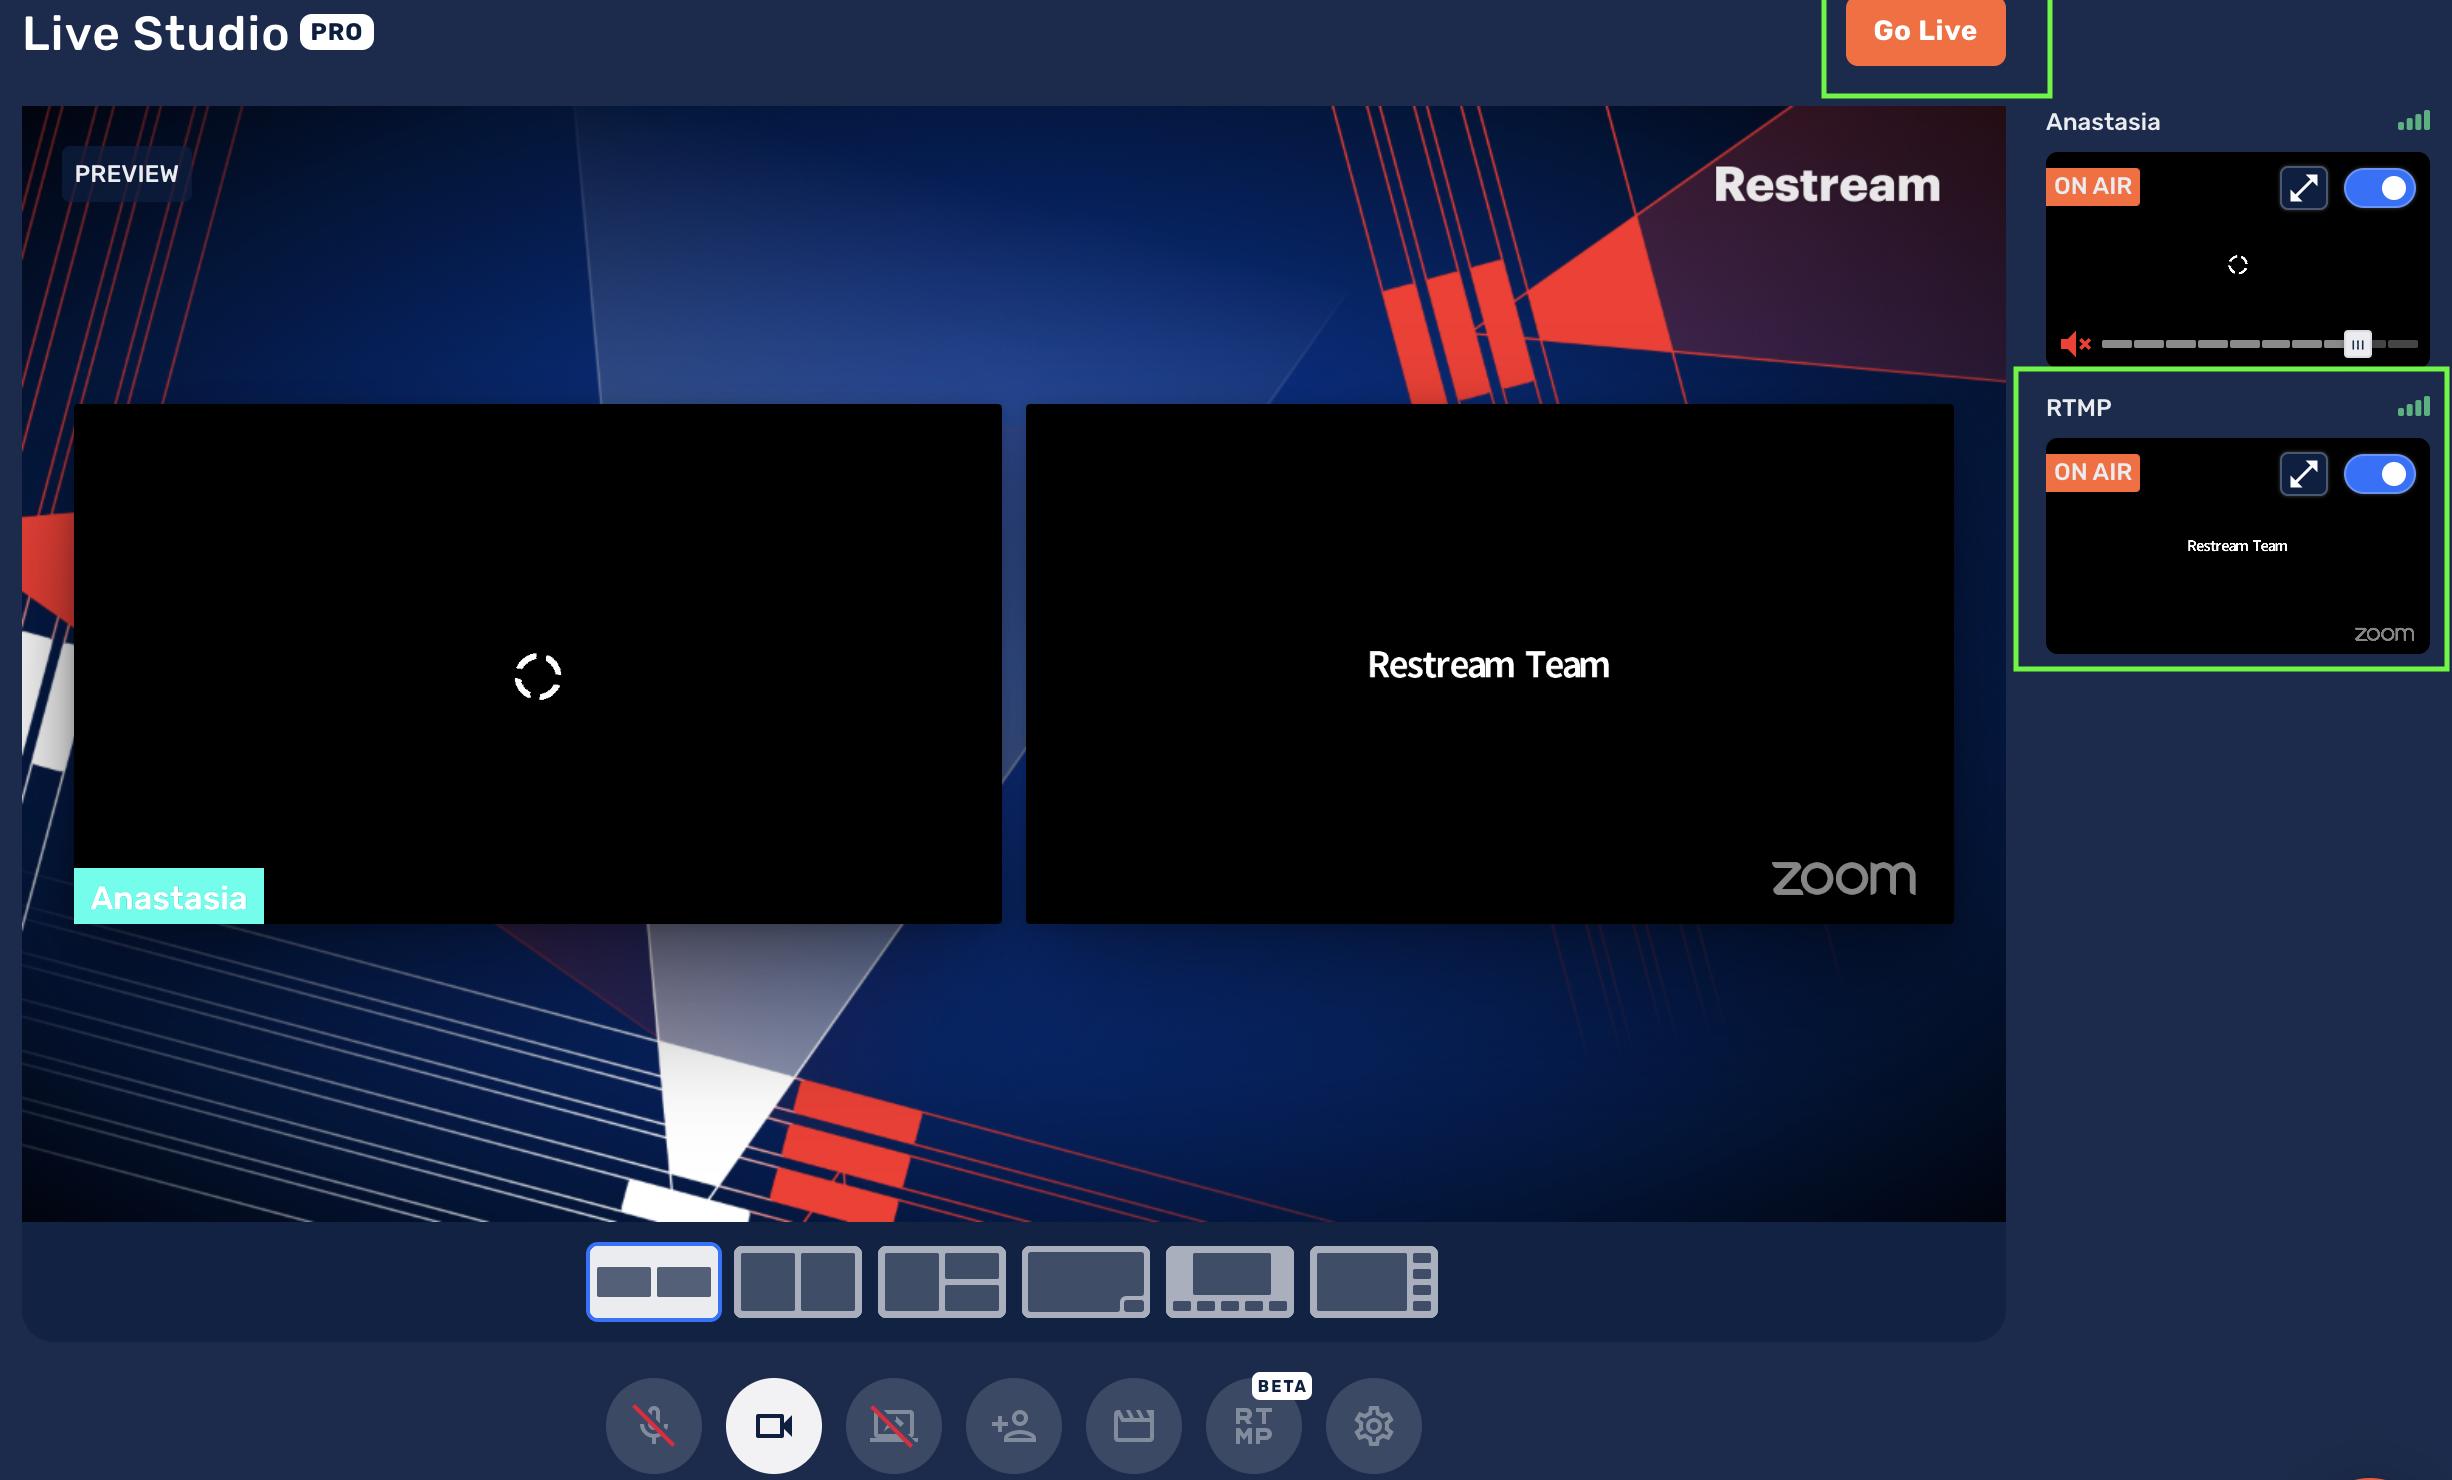 Zoom live stream with Restream Studio